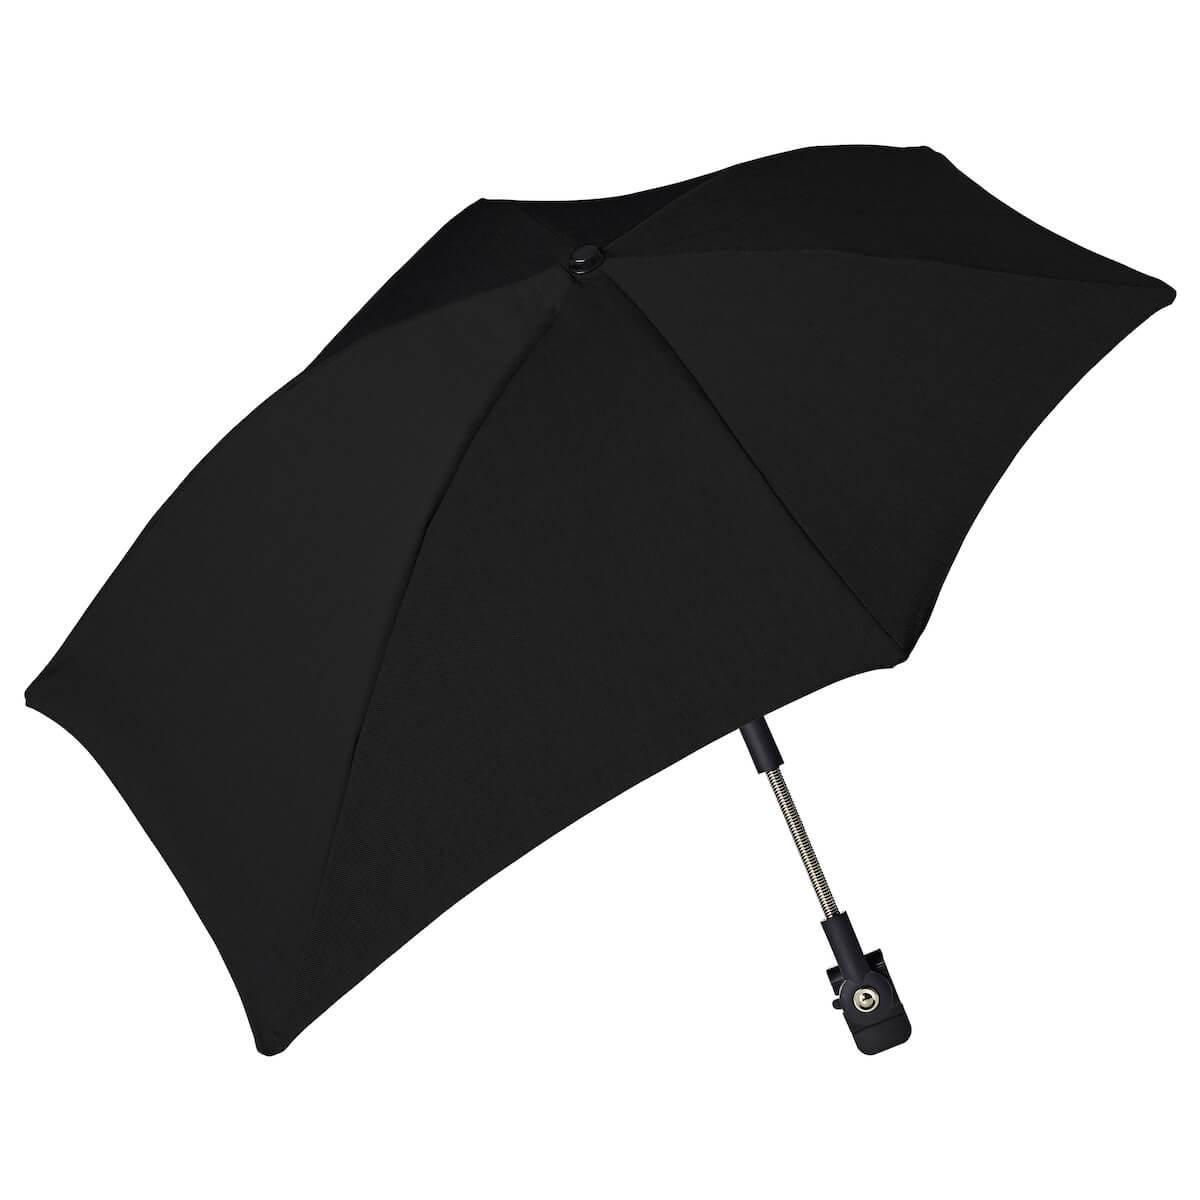 Ombrelle UNI² Joolz Brilliant black